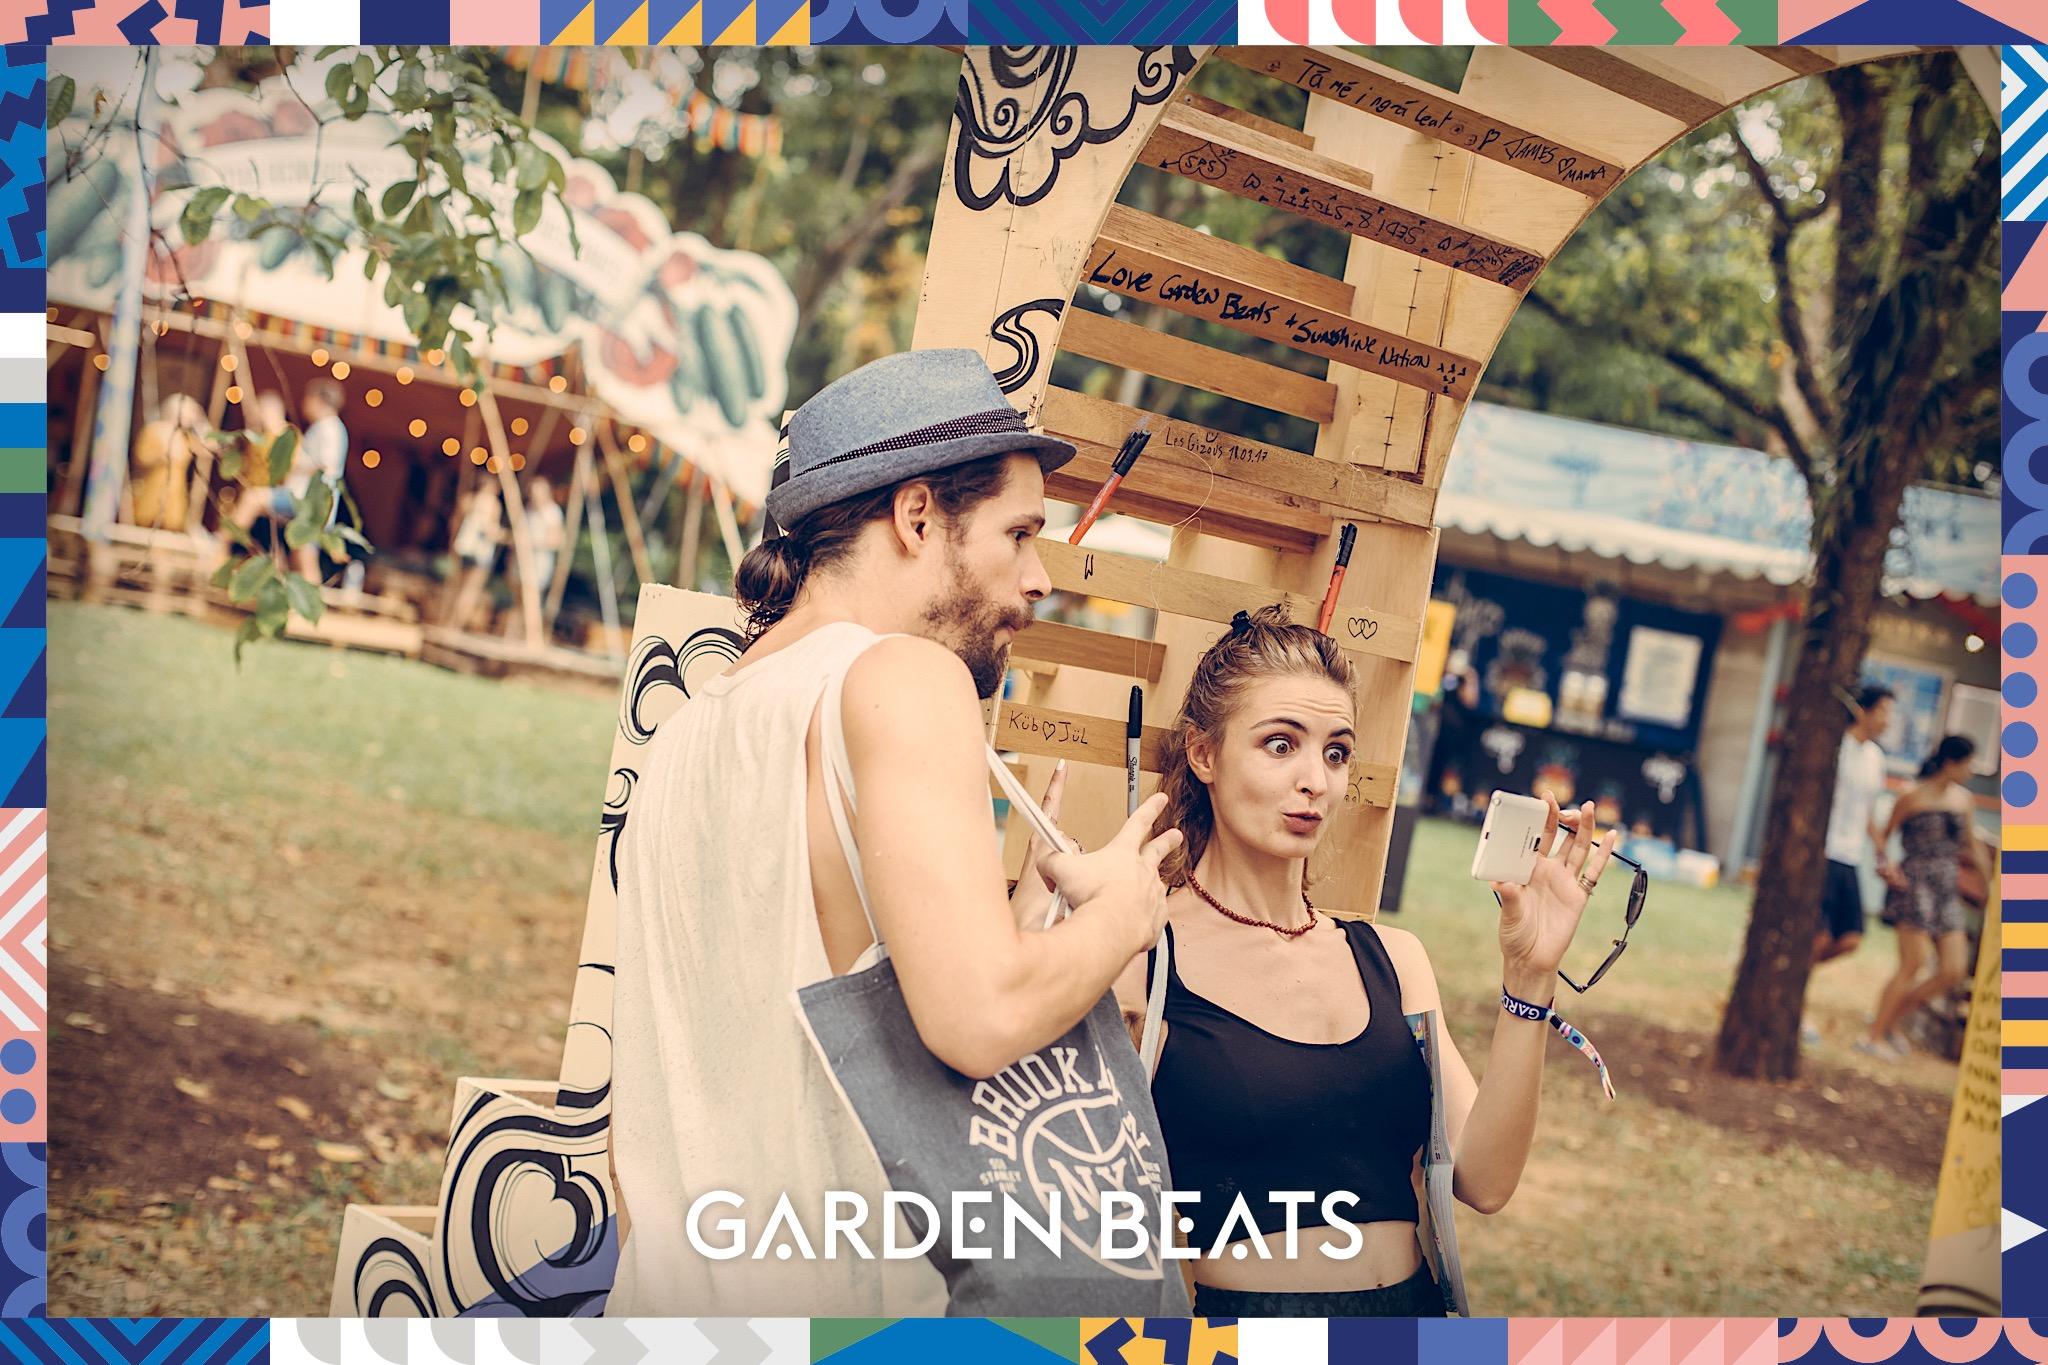 03032018_GardenBeats_Colossal088_Watermarked.jpg